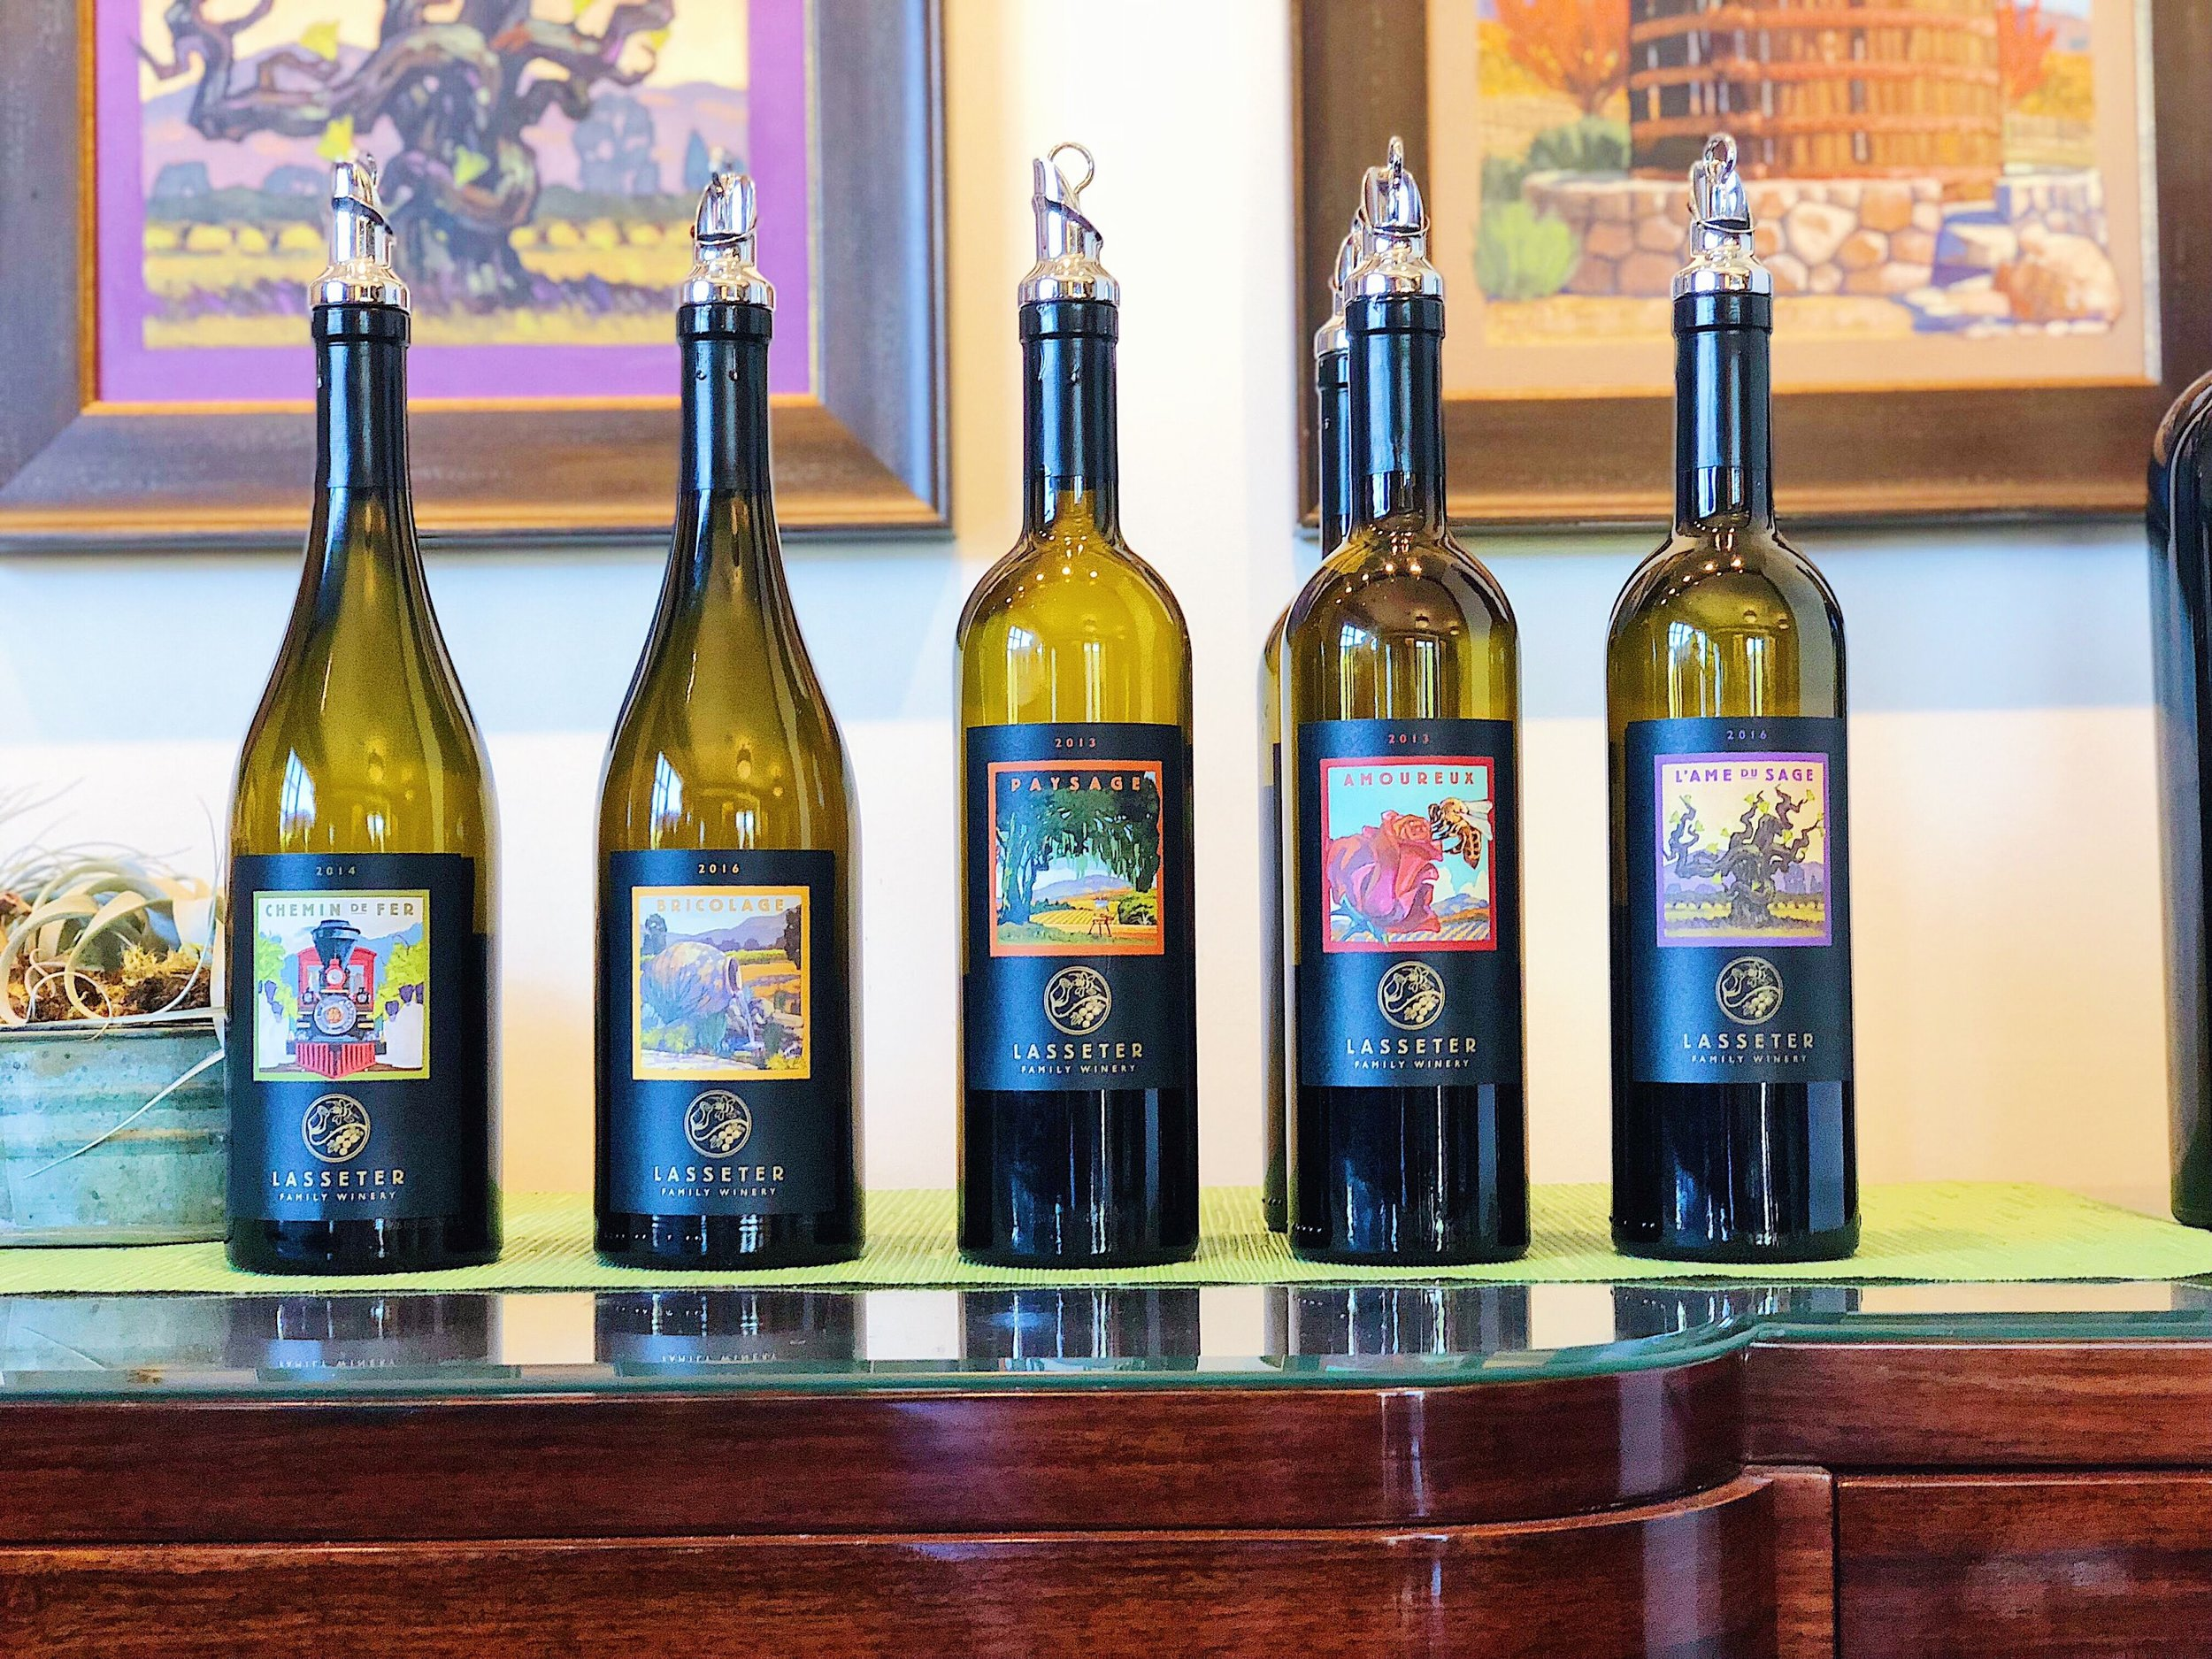 Lasseter Wines